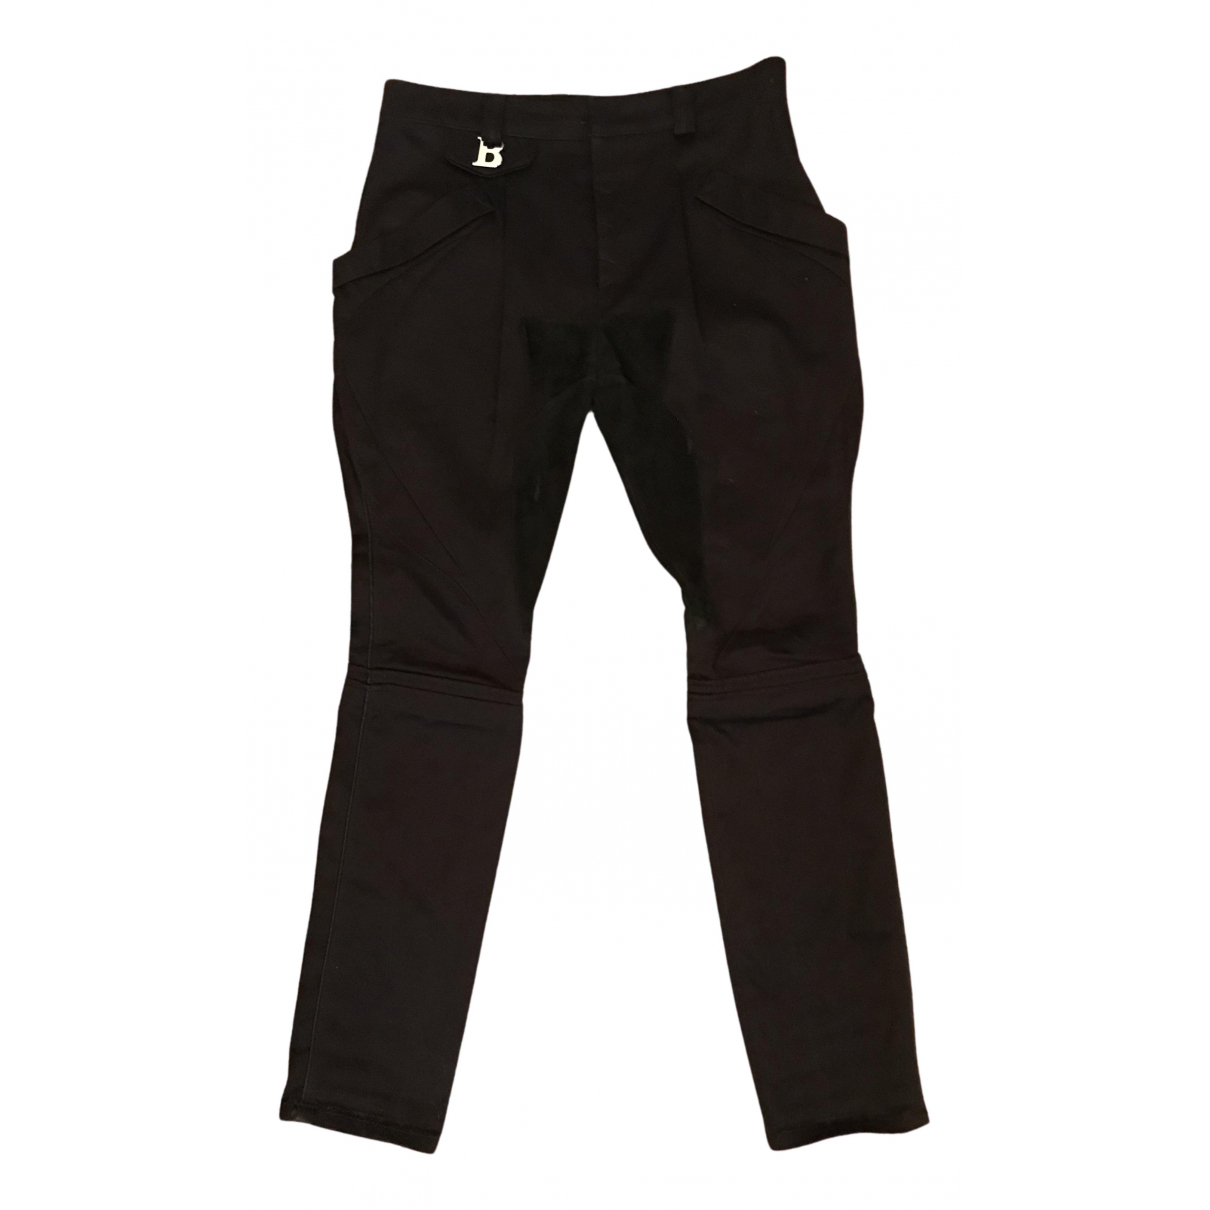 Balenciaga N Black Cotton Trousers for Women 40 FR